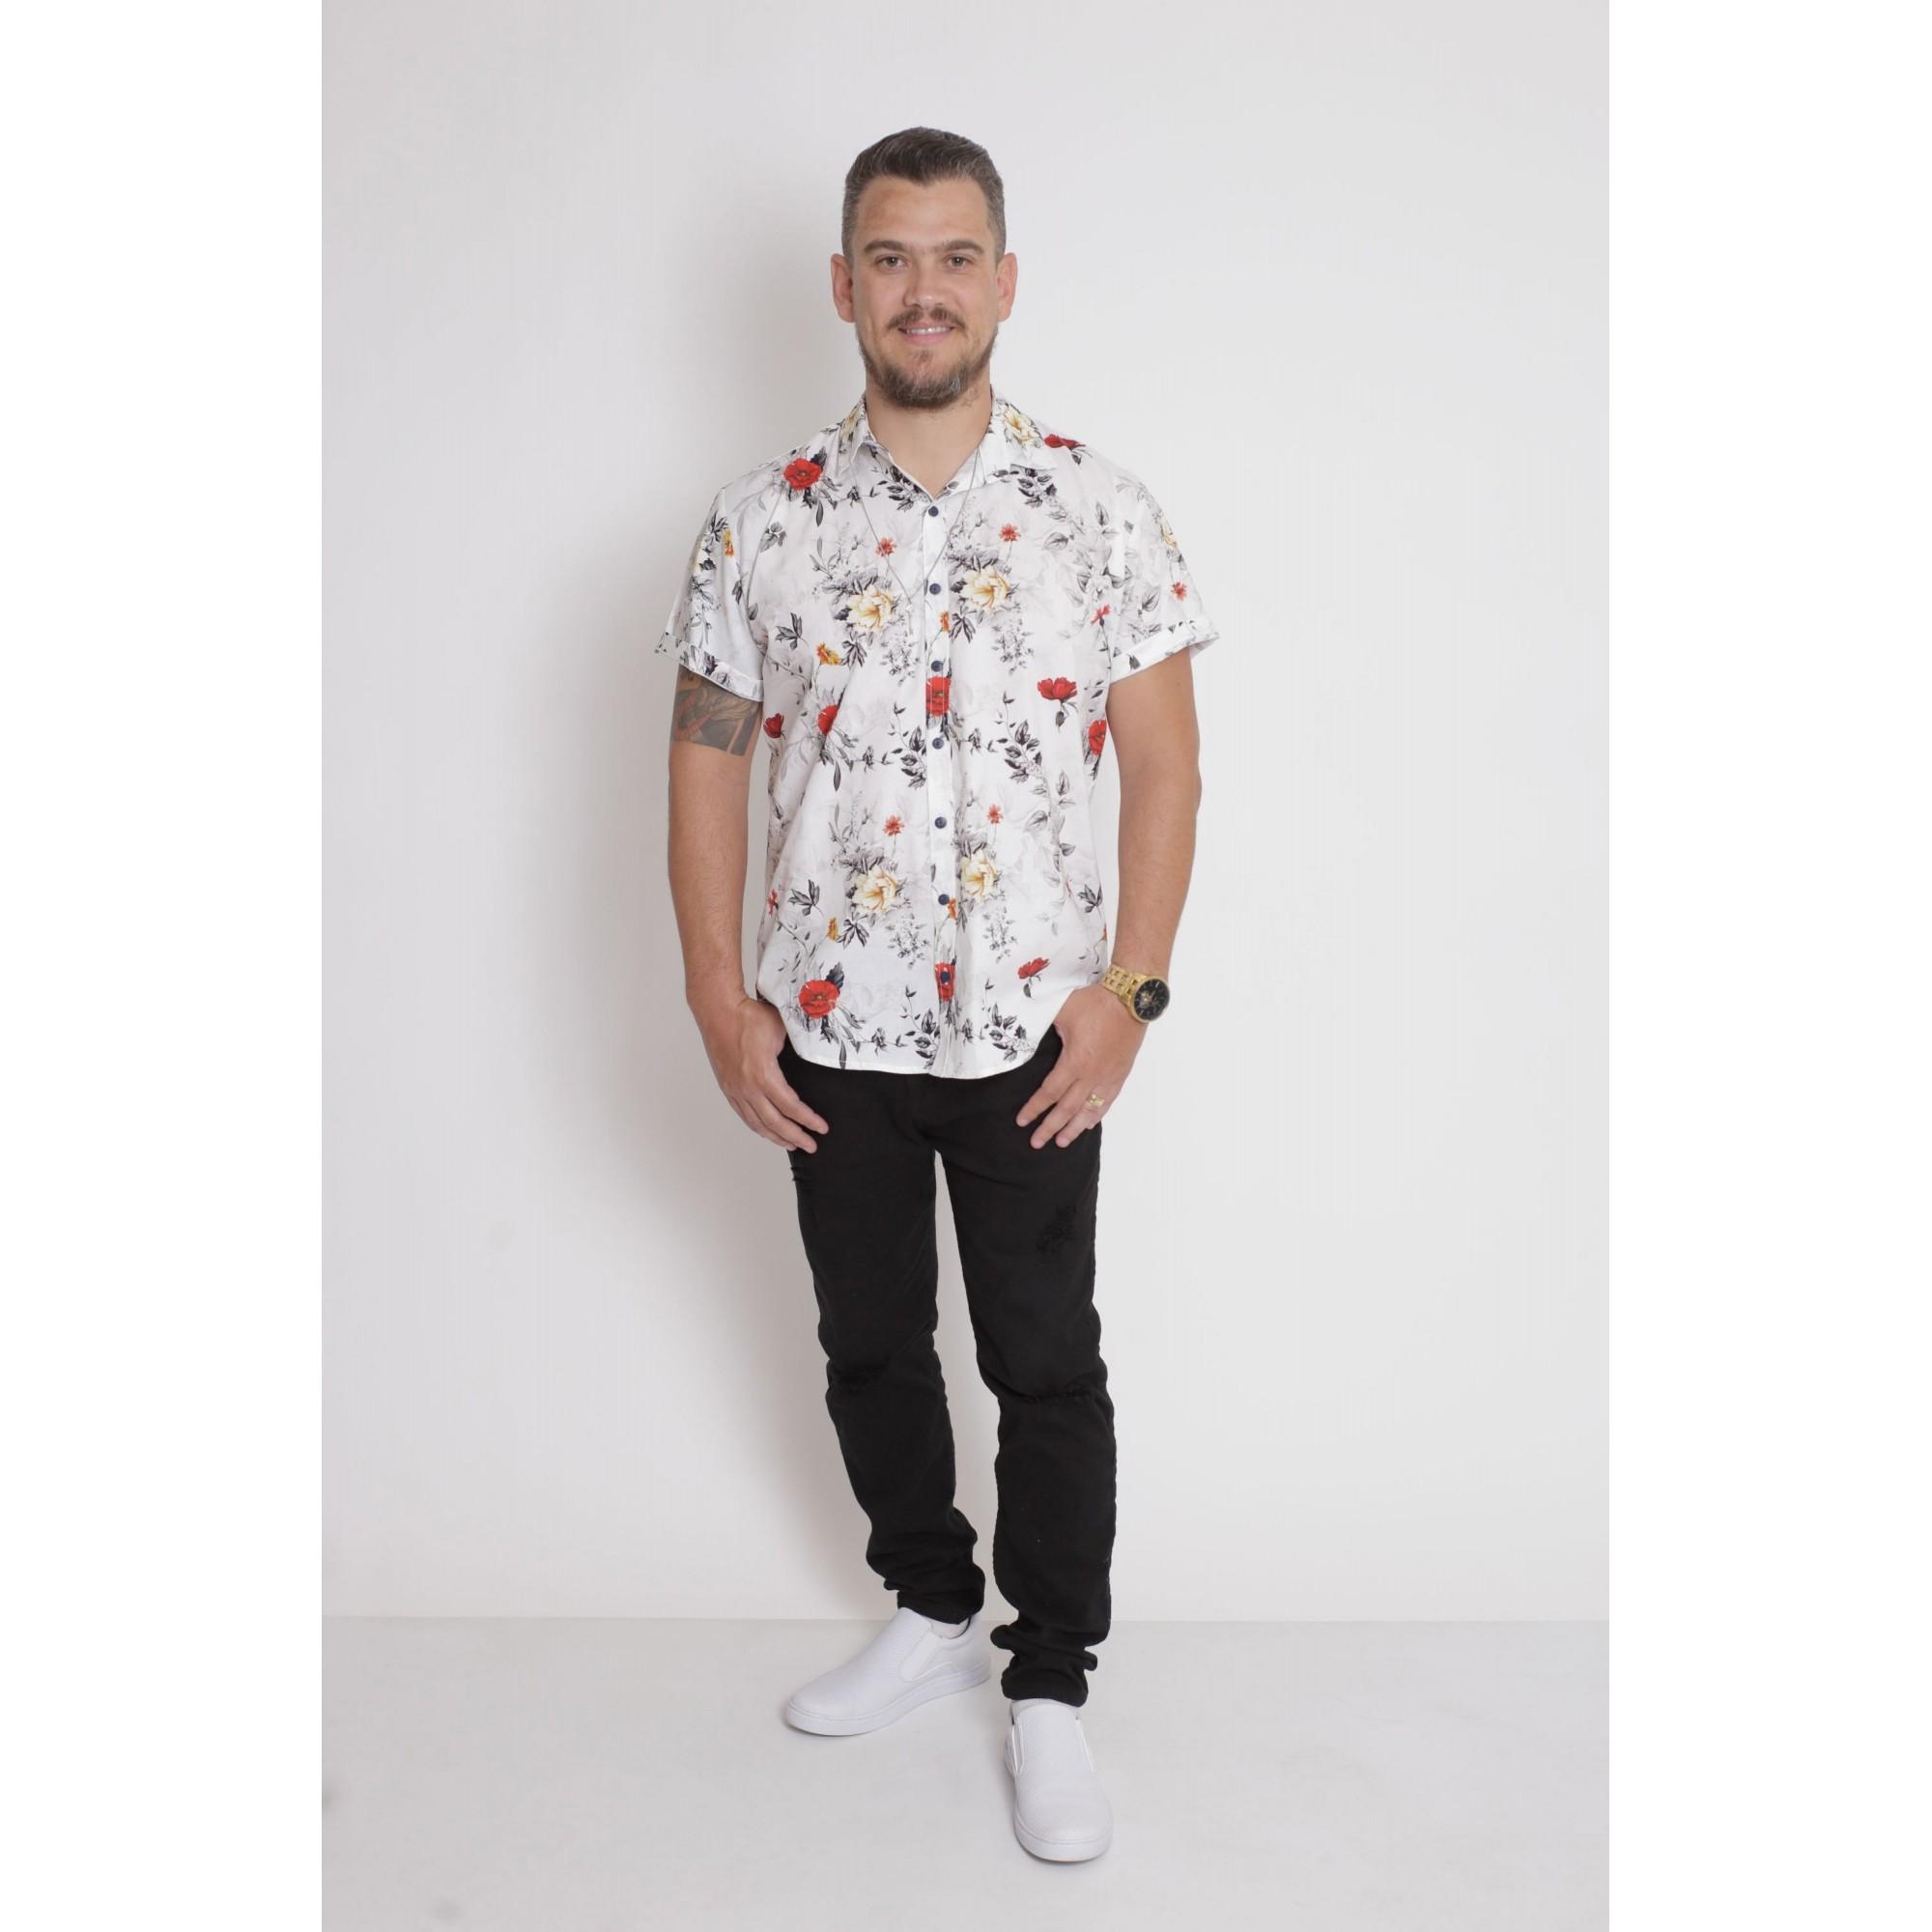 PAI E FILHO > Kit 02 Camisas Manga Curta Branca Floral  [Coleção Tal Pai Tal Filho]  - Heitor Fashion Brazil